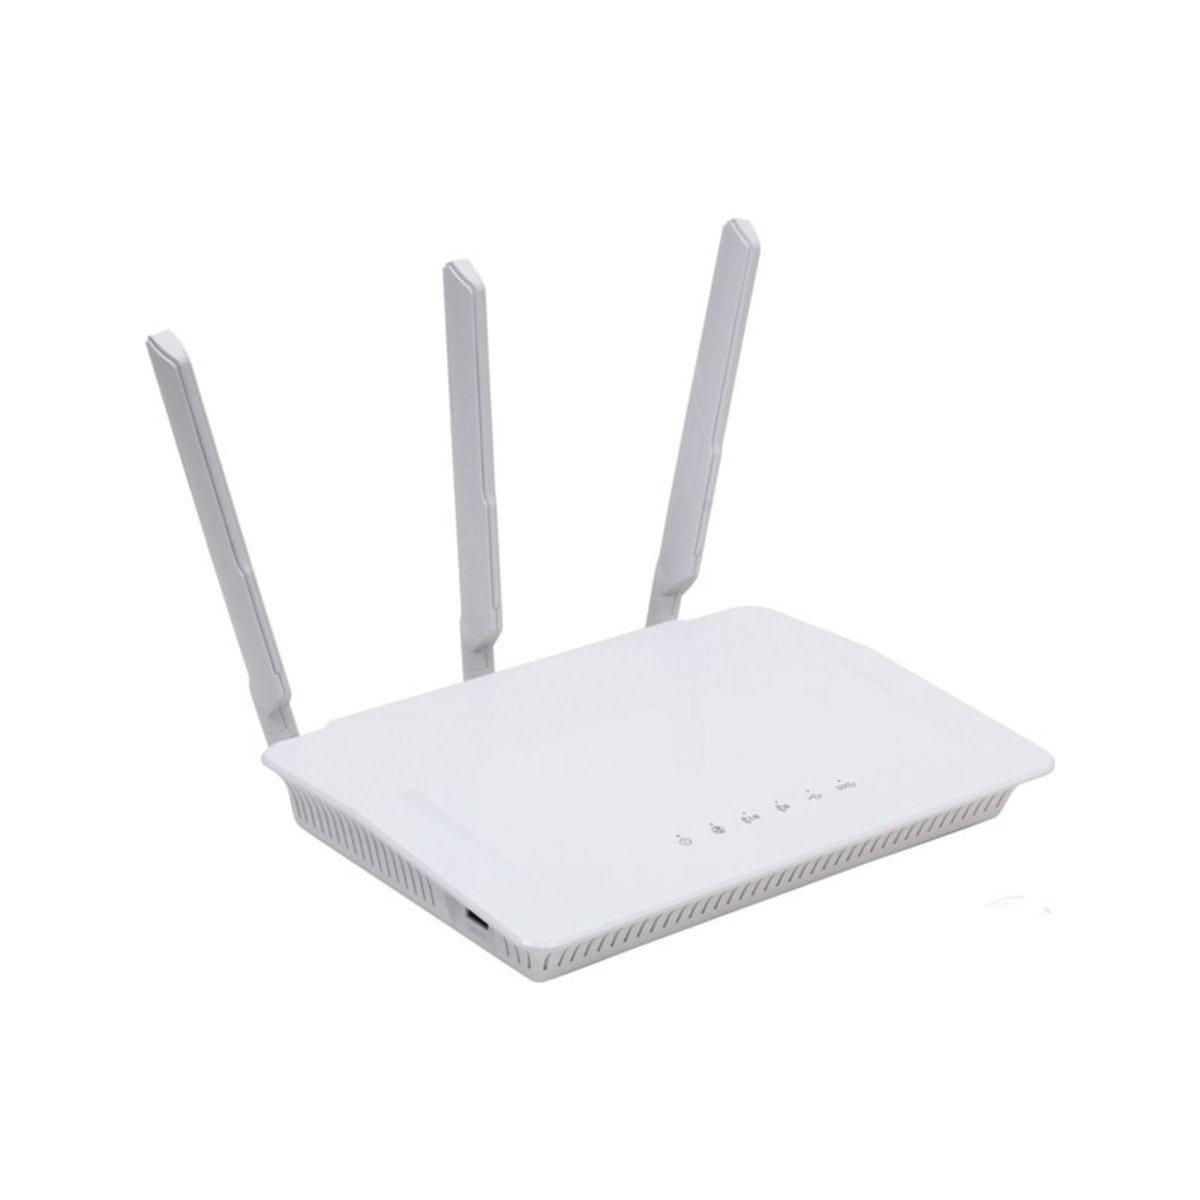 AC1900 雙頻高效能三天線無線路由器 DIR880L